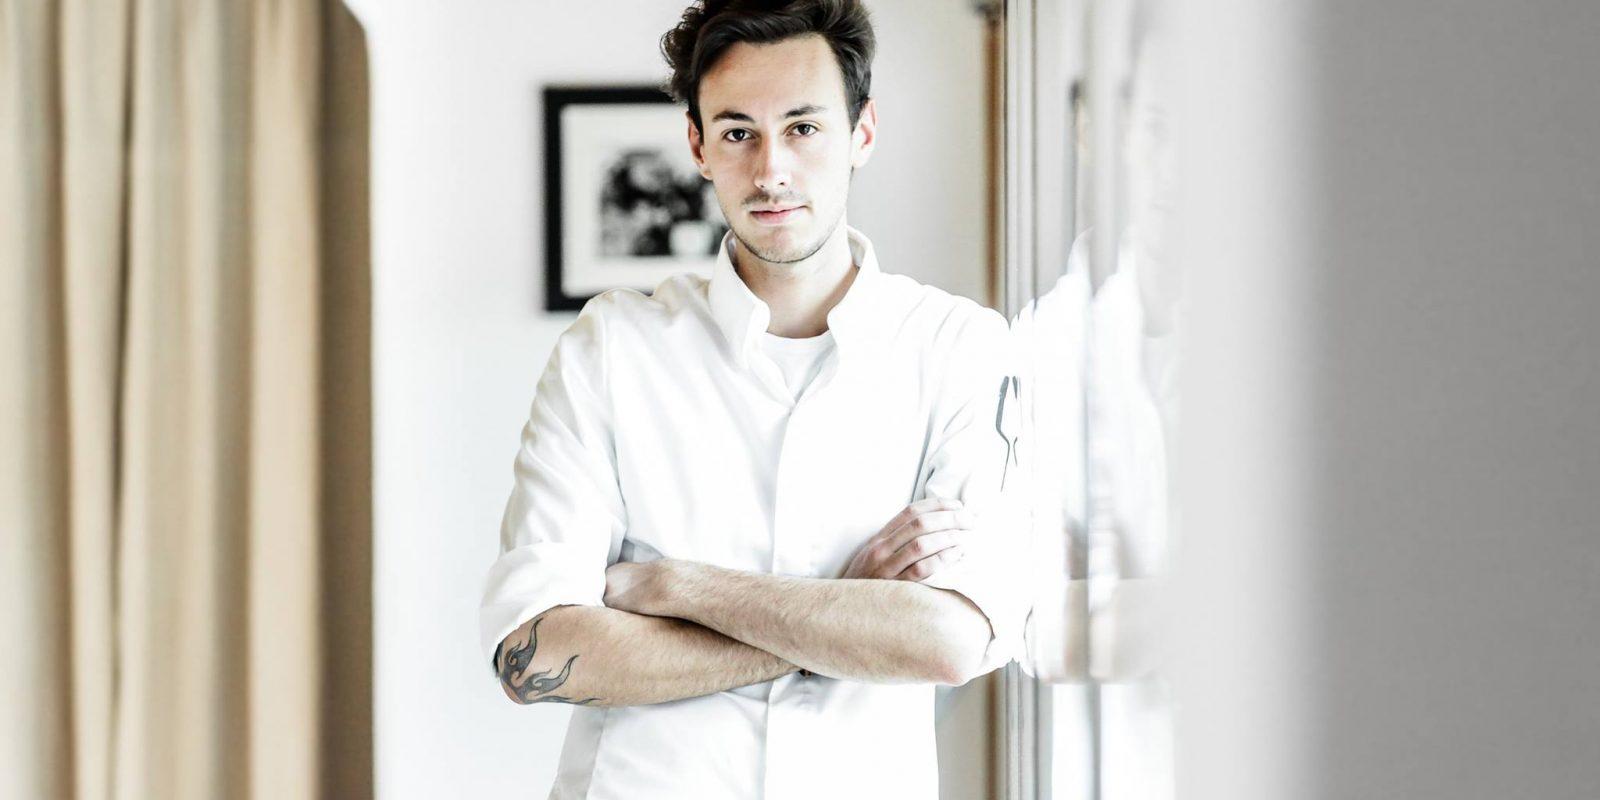 Chef  La Cucina Italiana